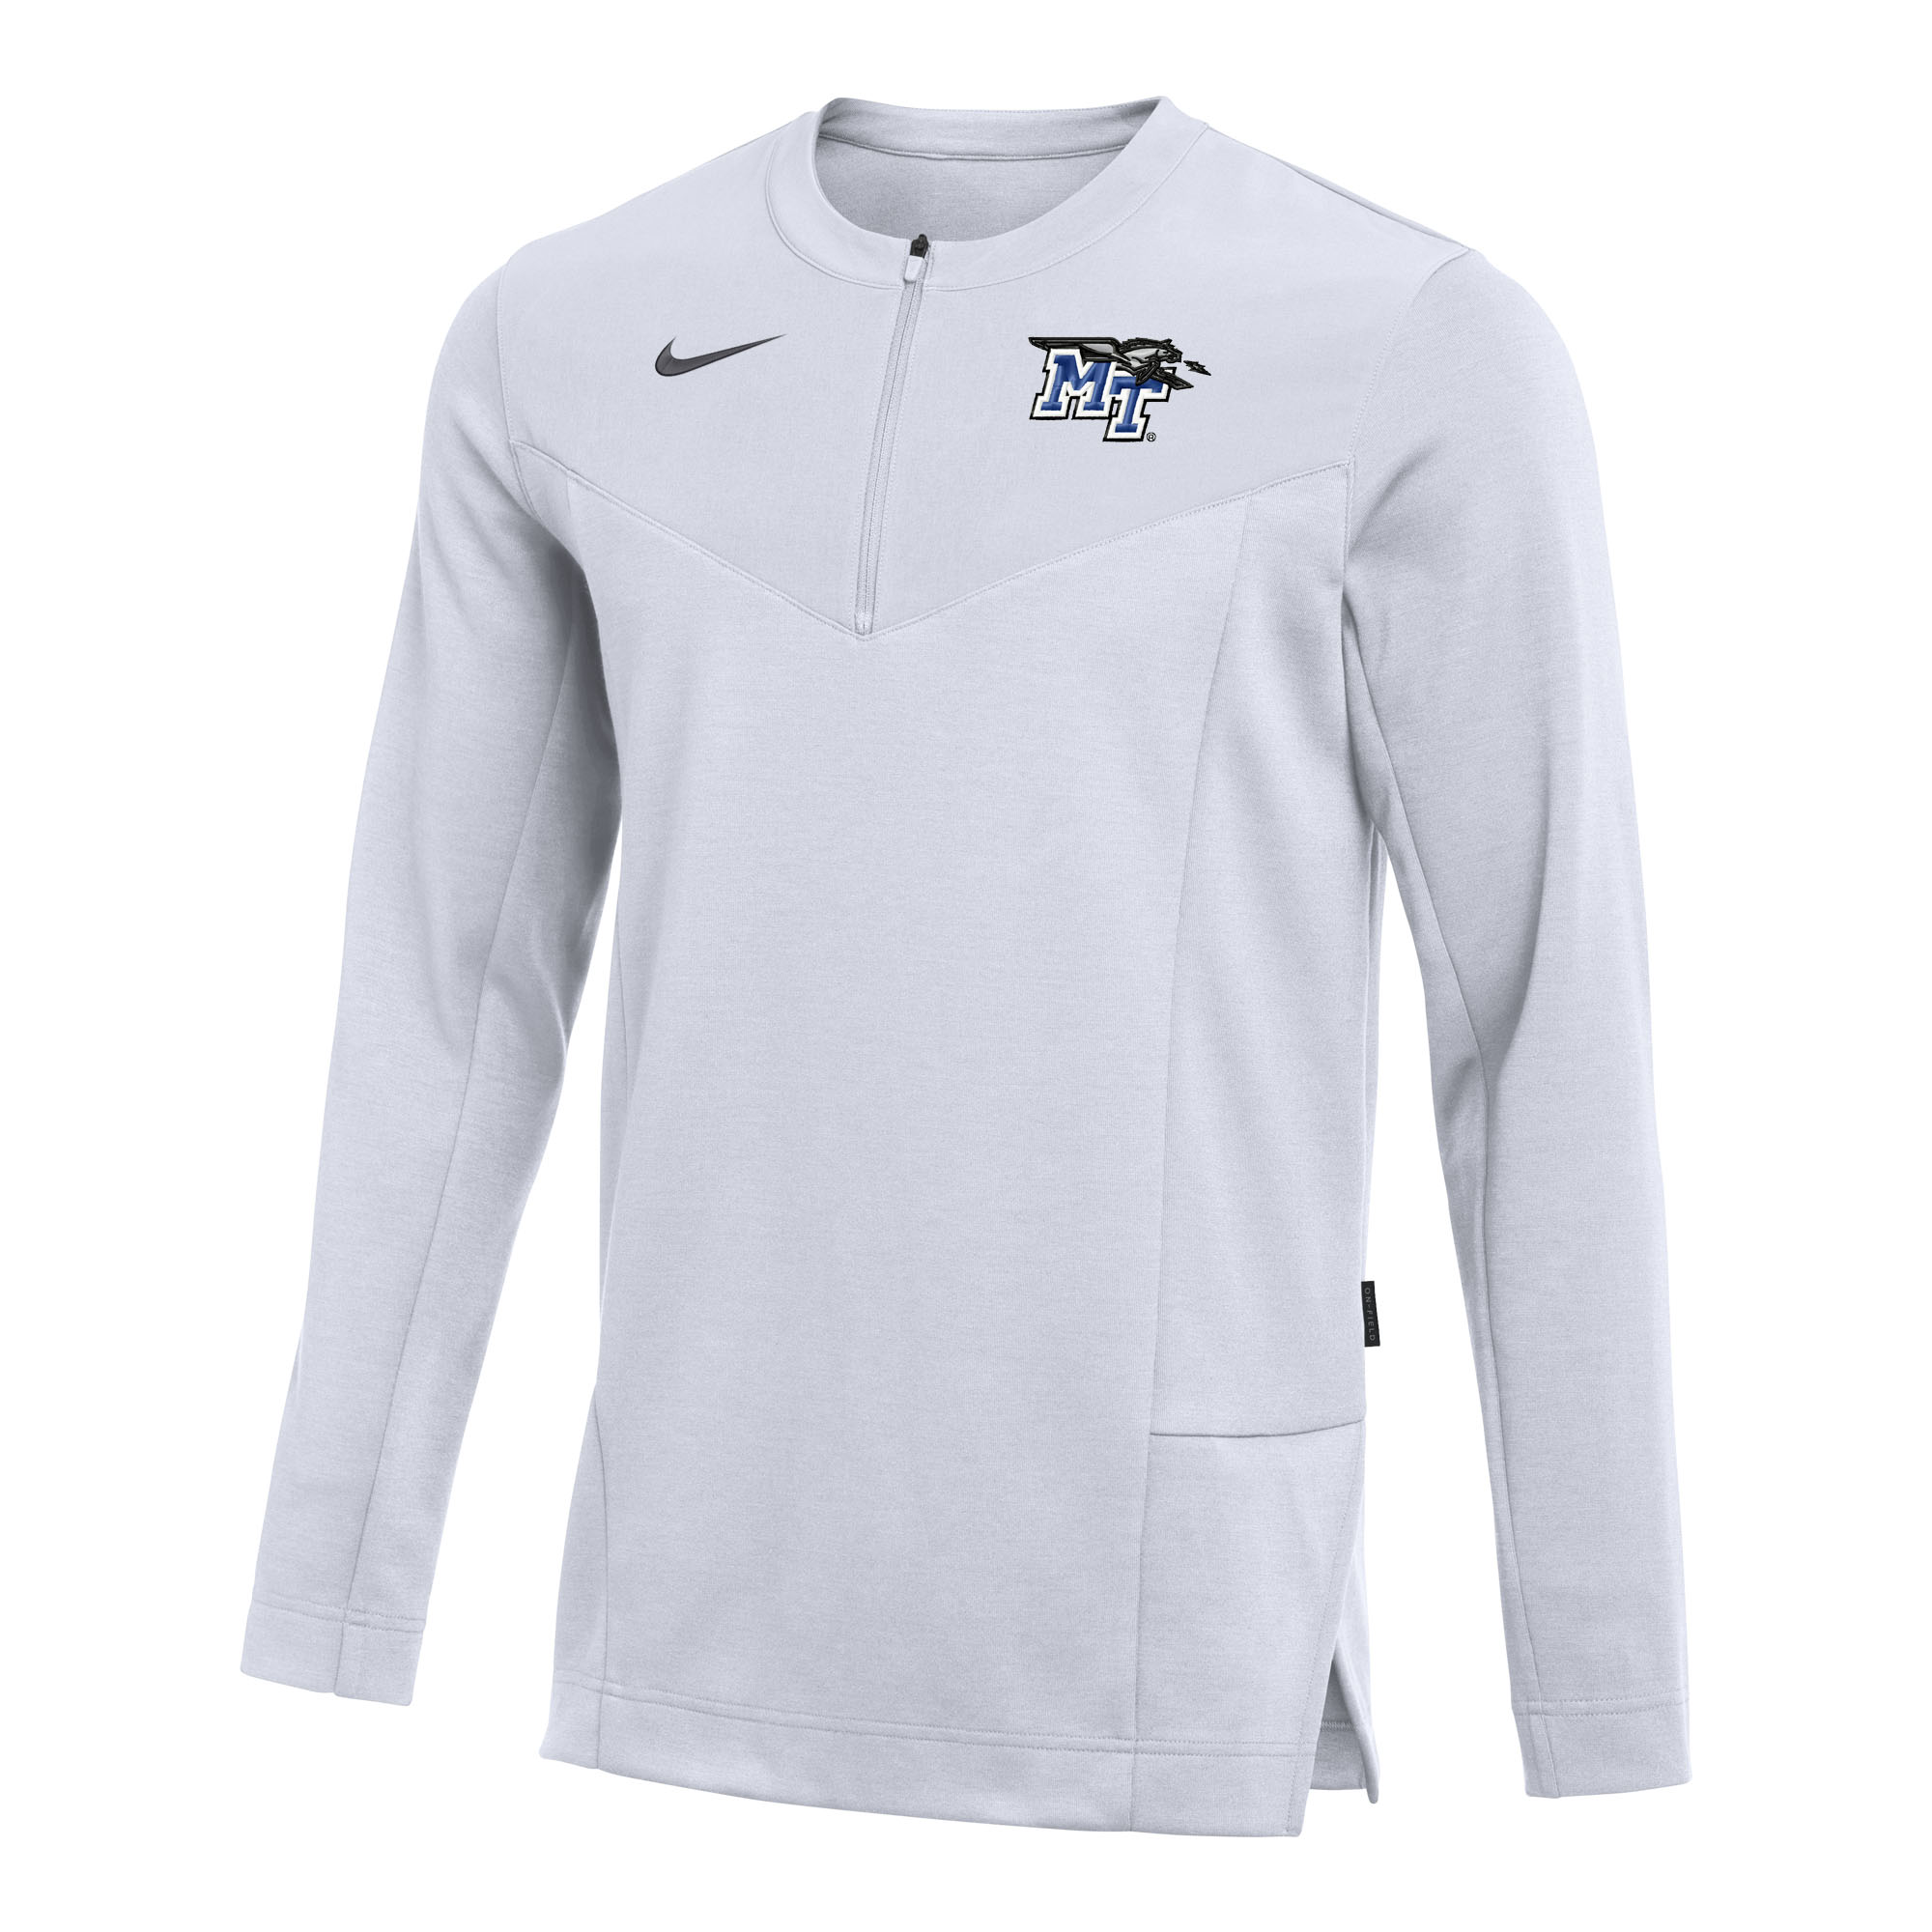 MT Logo w/ Lightning UV Coach Nike Sideline® 1/2 Zip Top